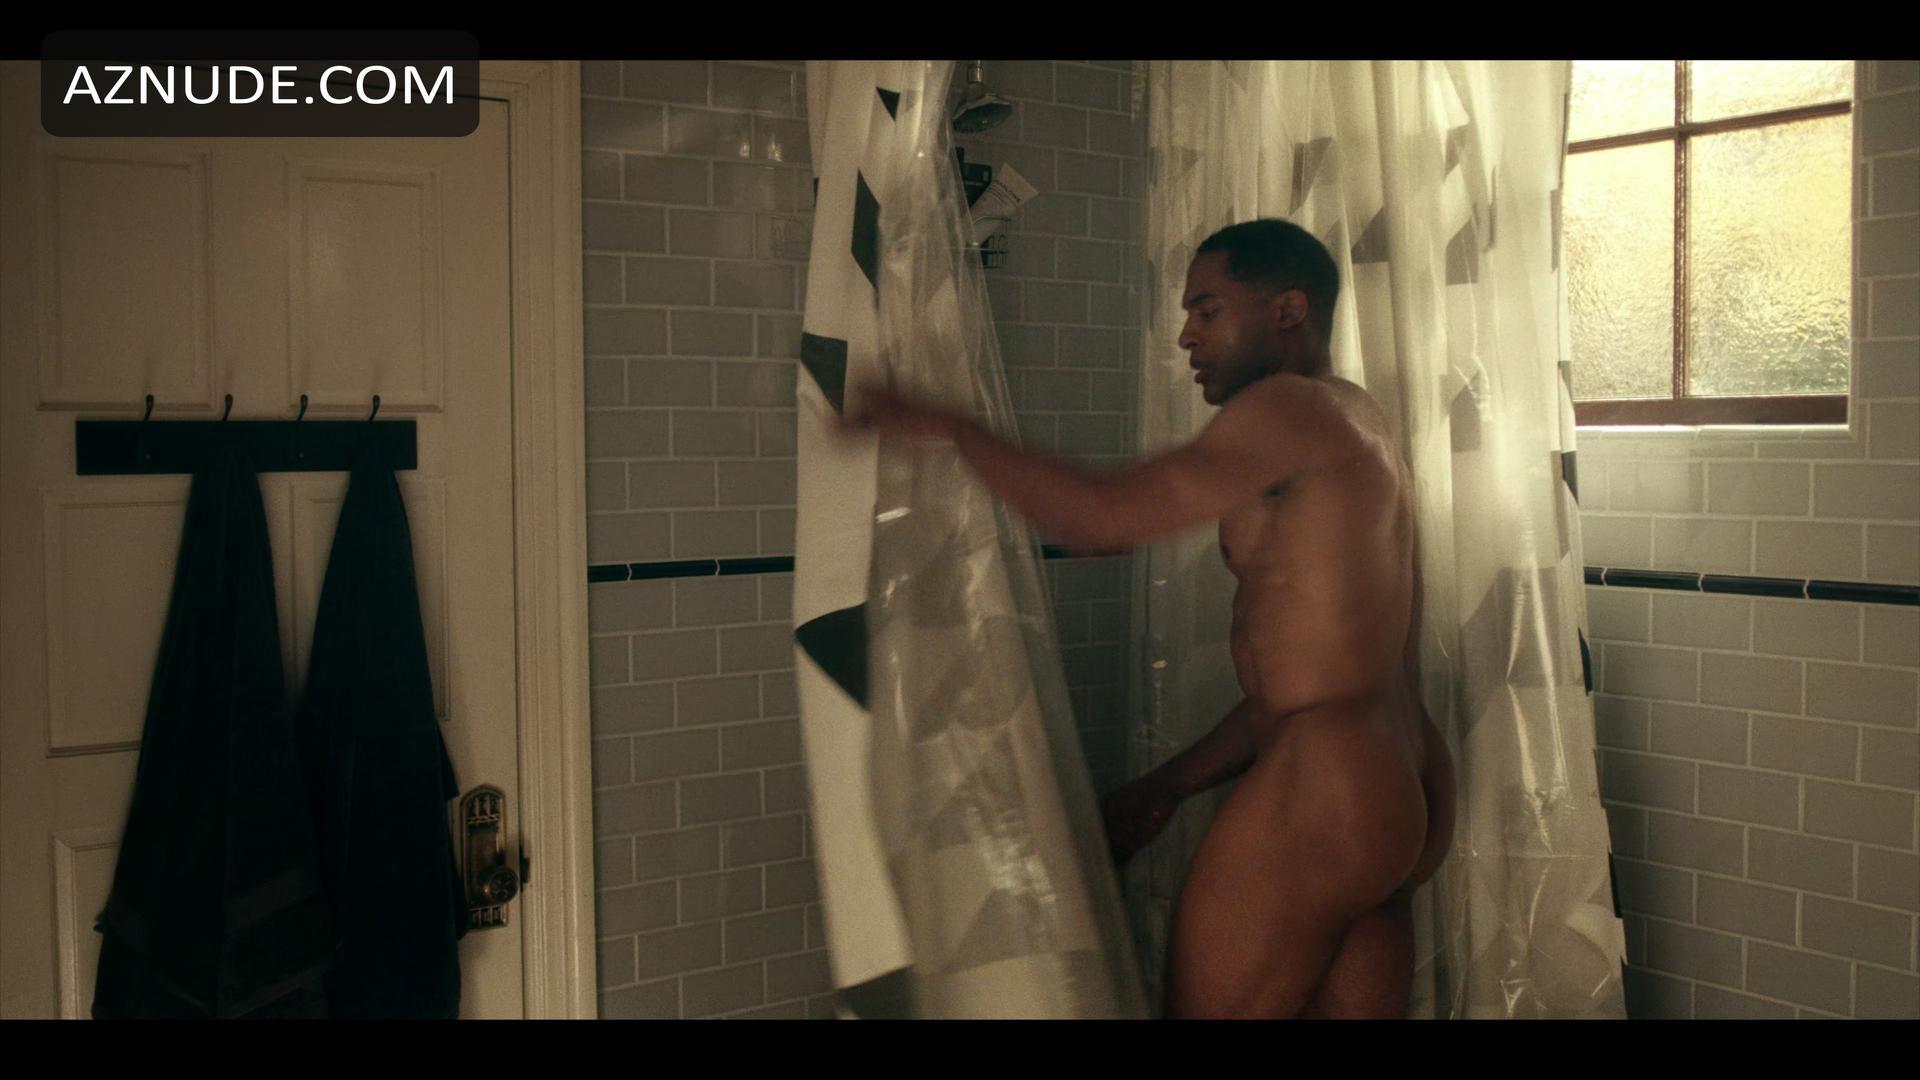 Dear White People Nude Scenes - Aznude Men-9901